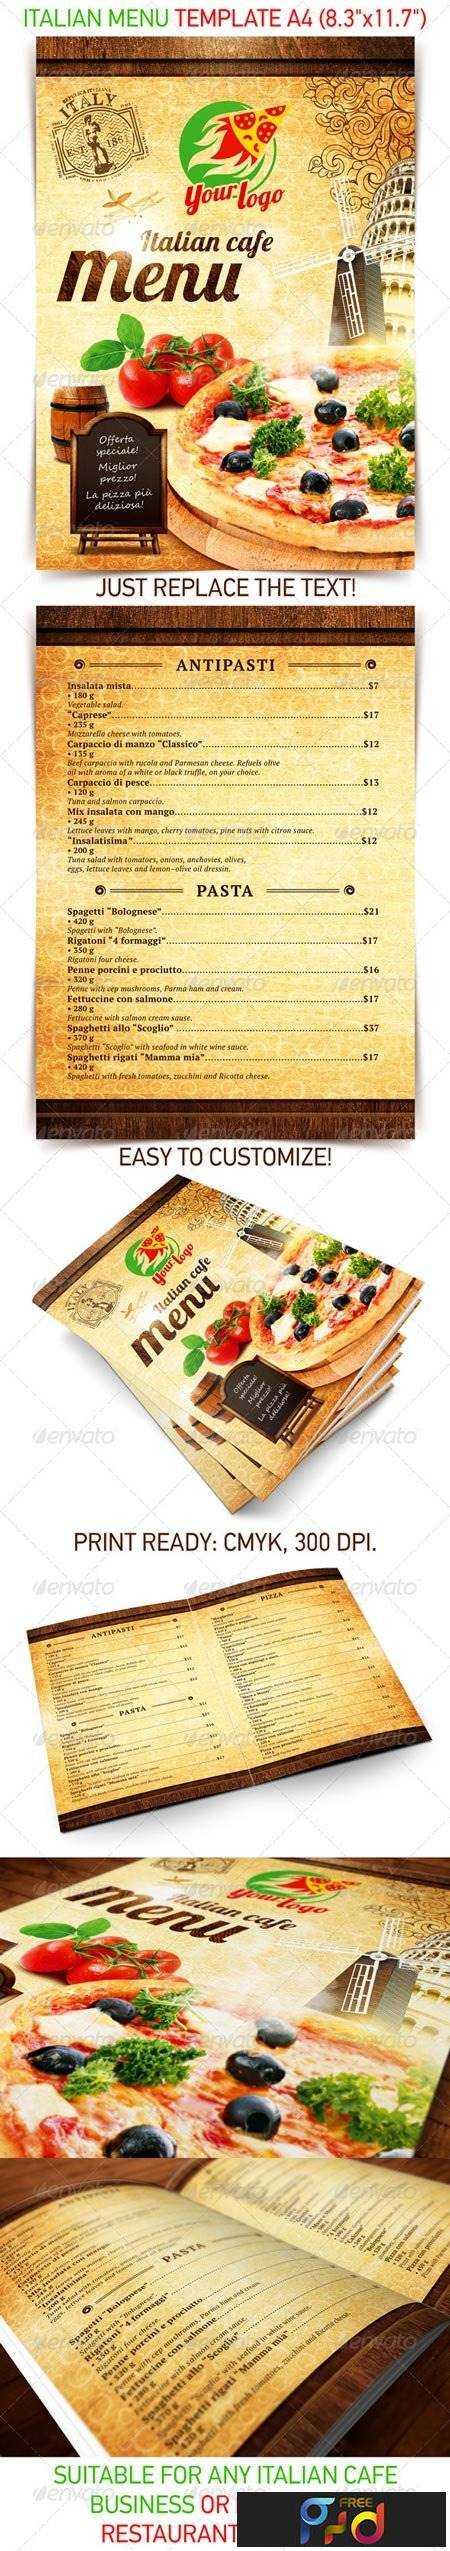 freepsdvn-com_1400475518_italian-menu-template-2502511